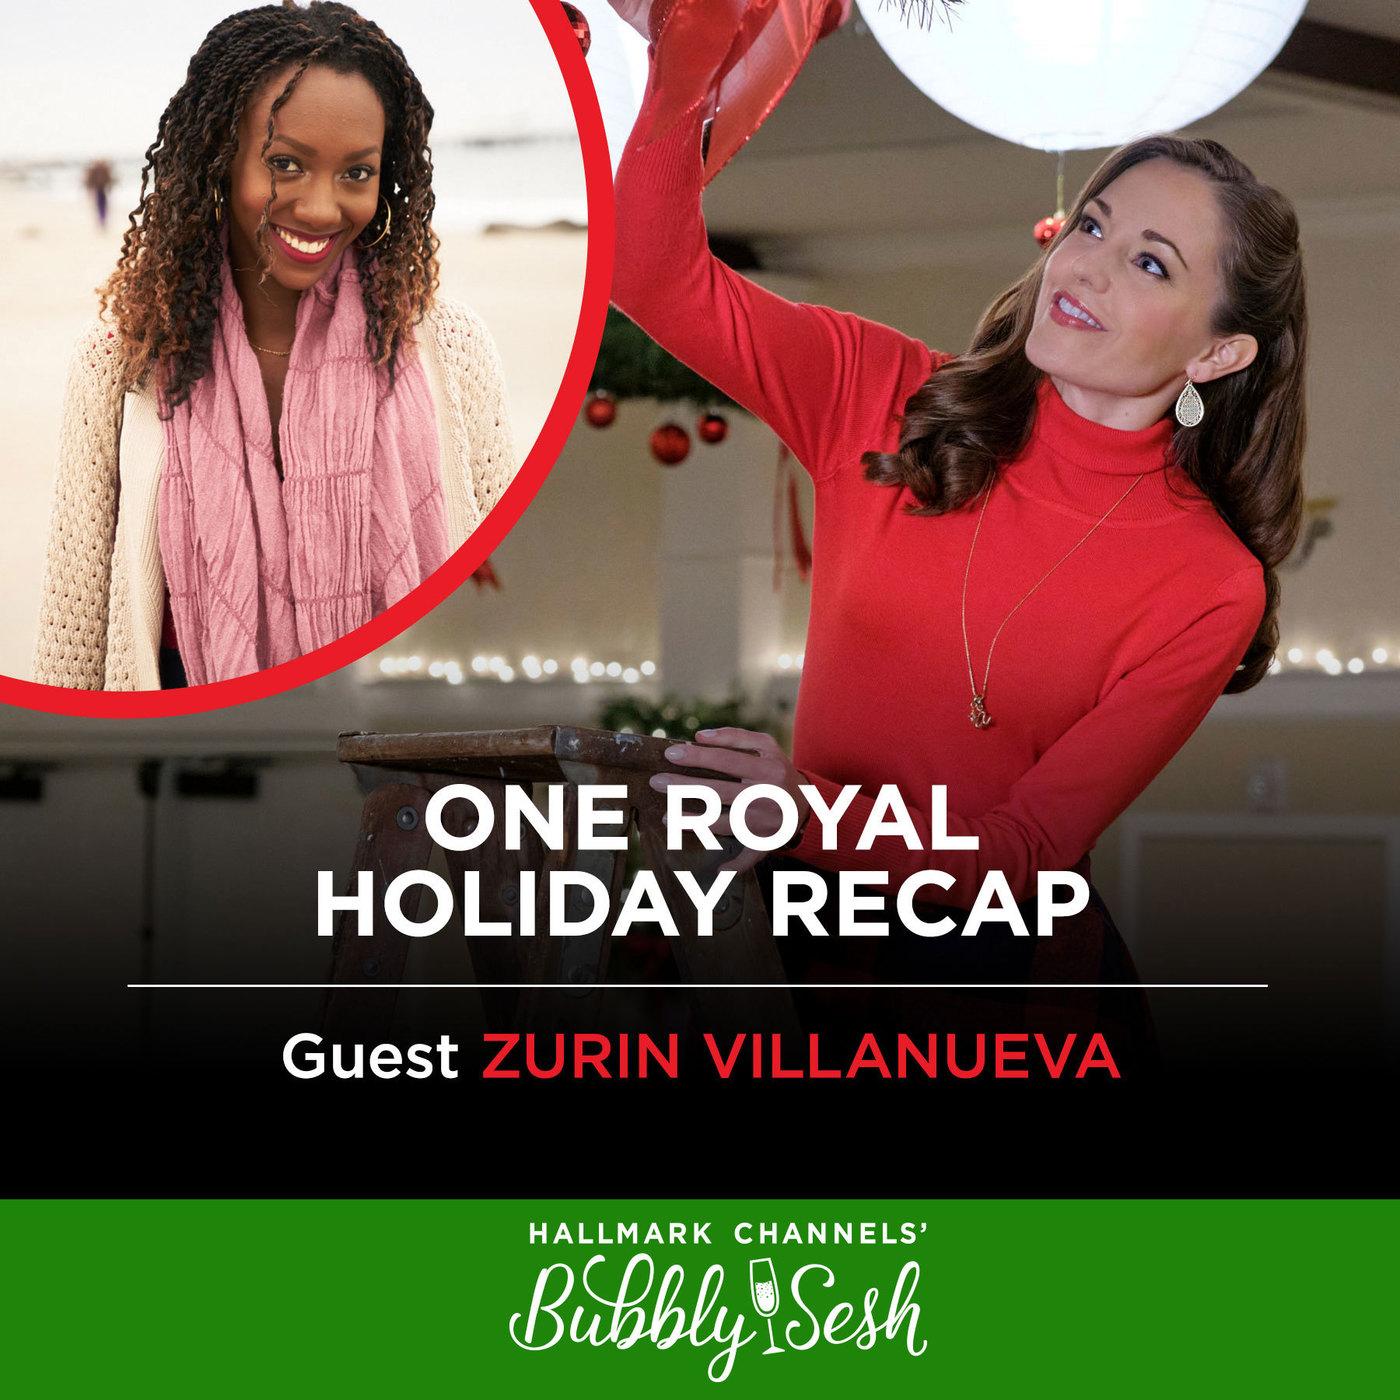 One Royal Holiday Recap with Guest Zurin Villanueva